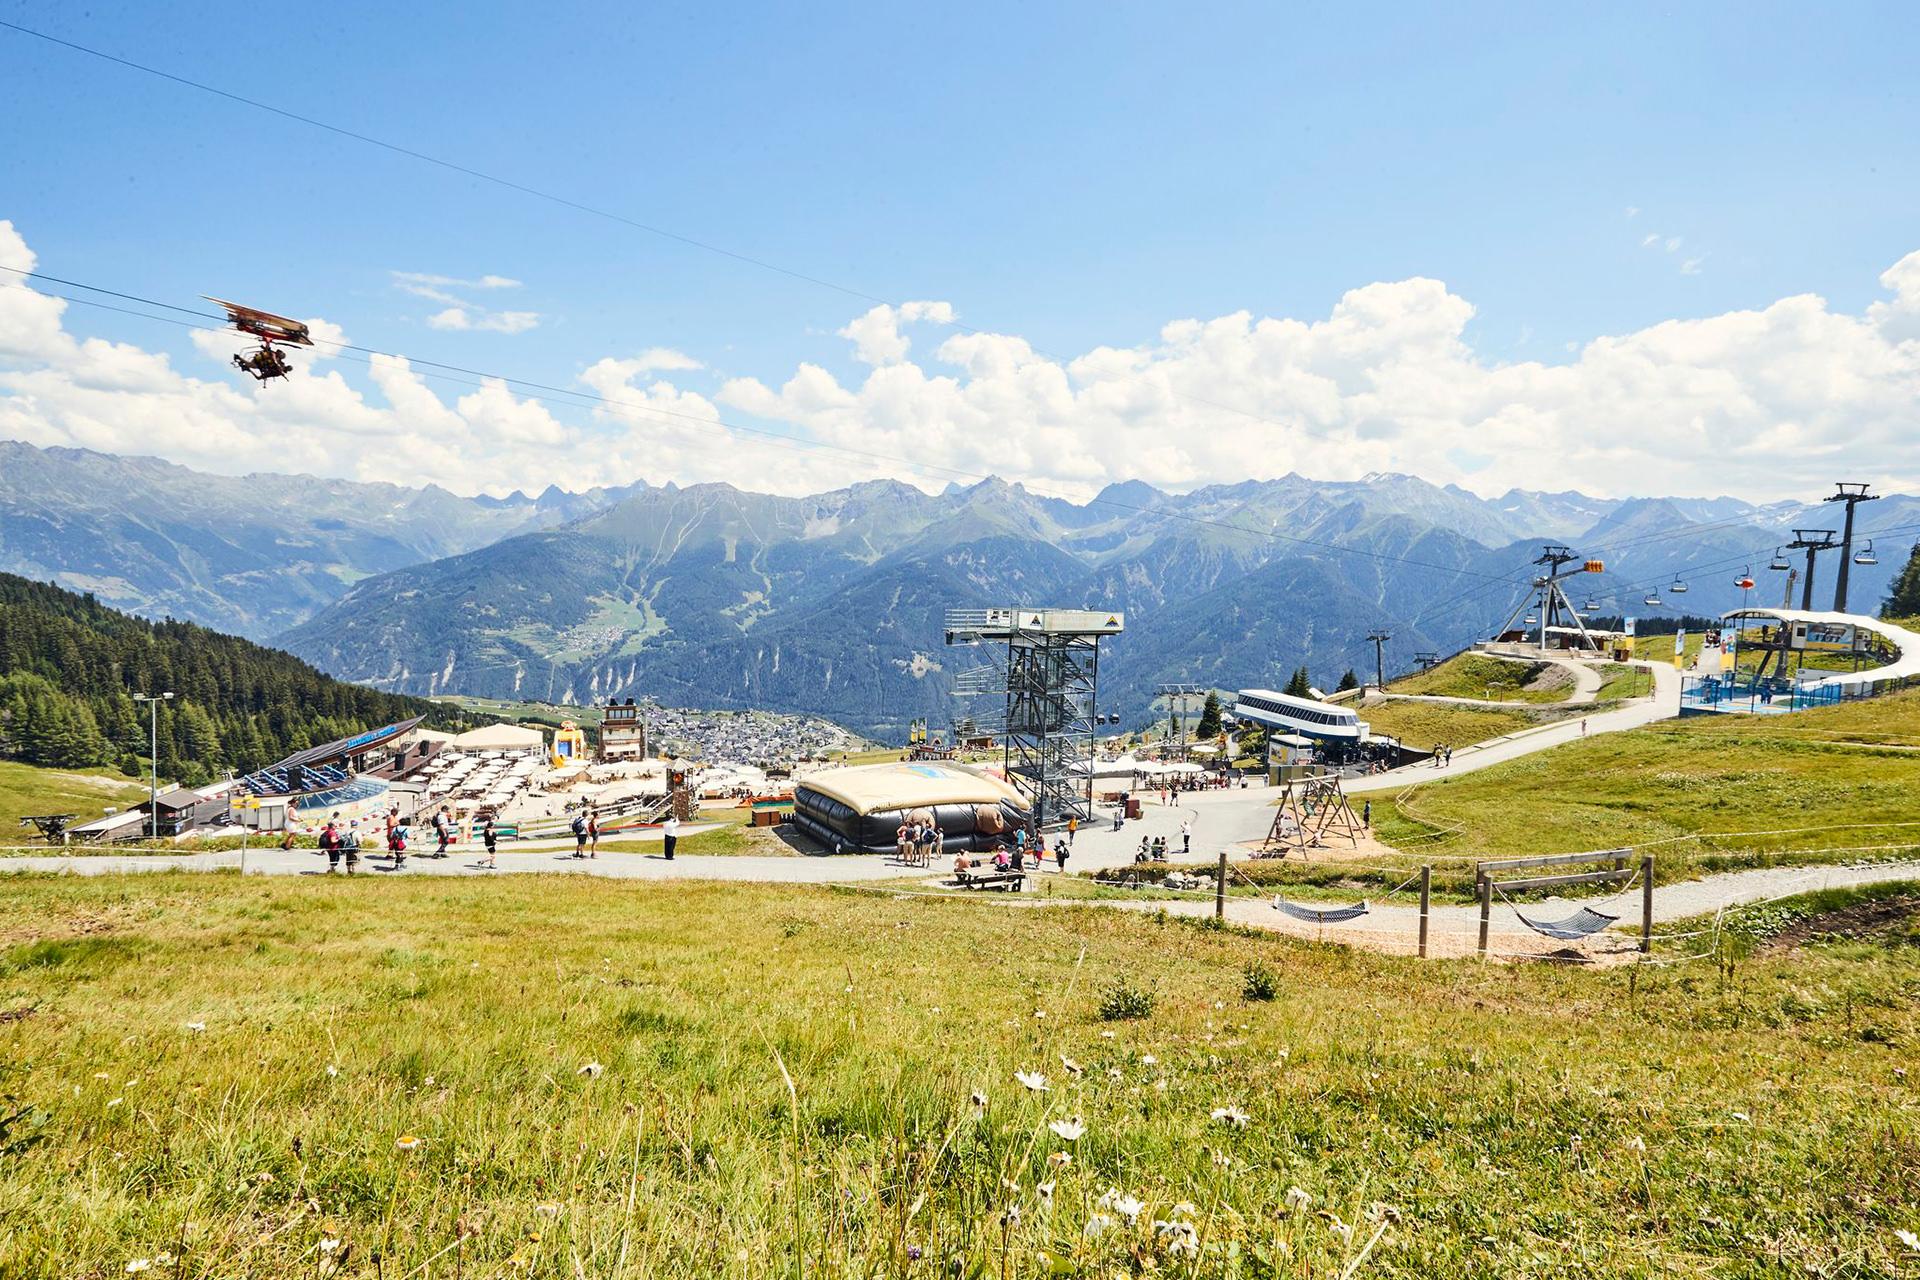 Bergbahnen_Fiss_27-07-2018-0110_web.jpg